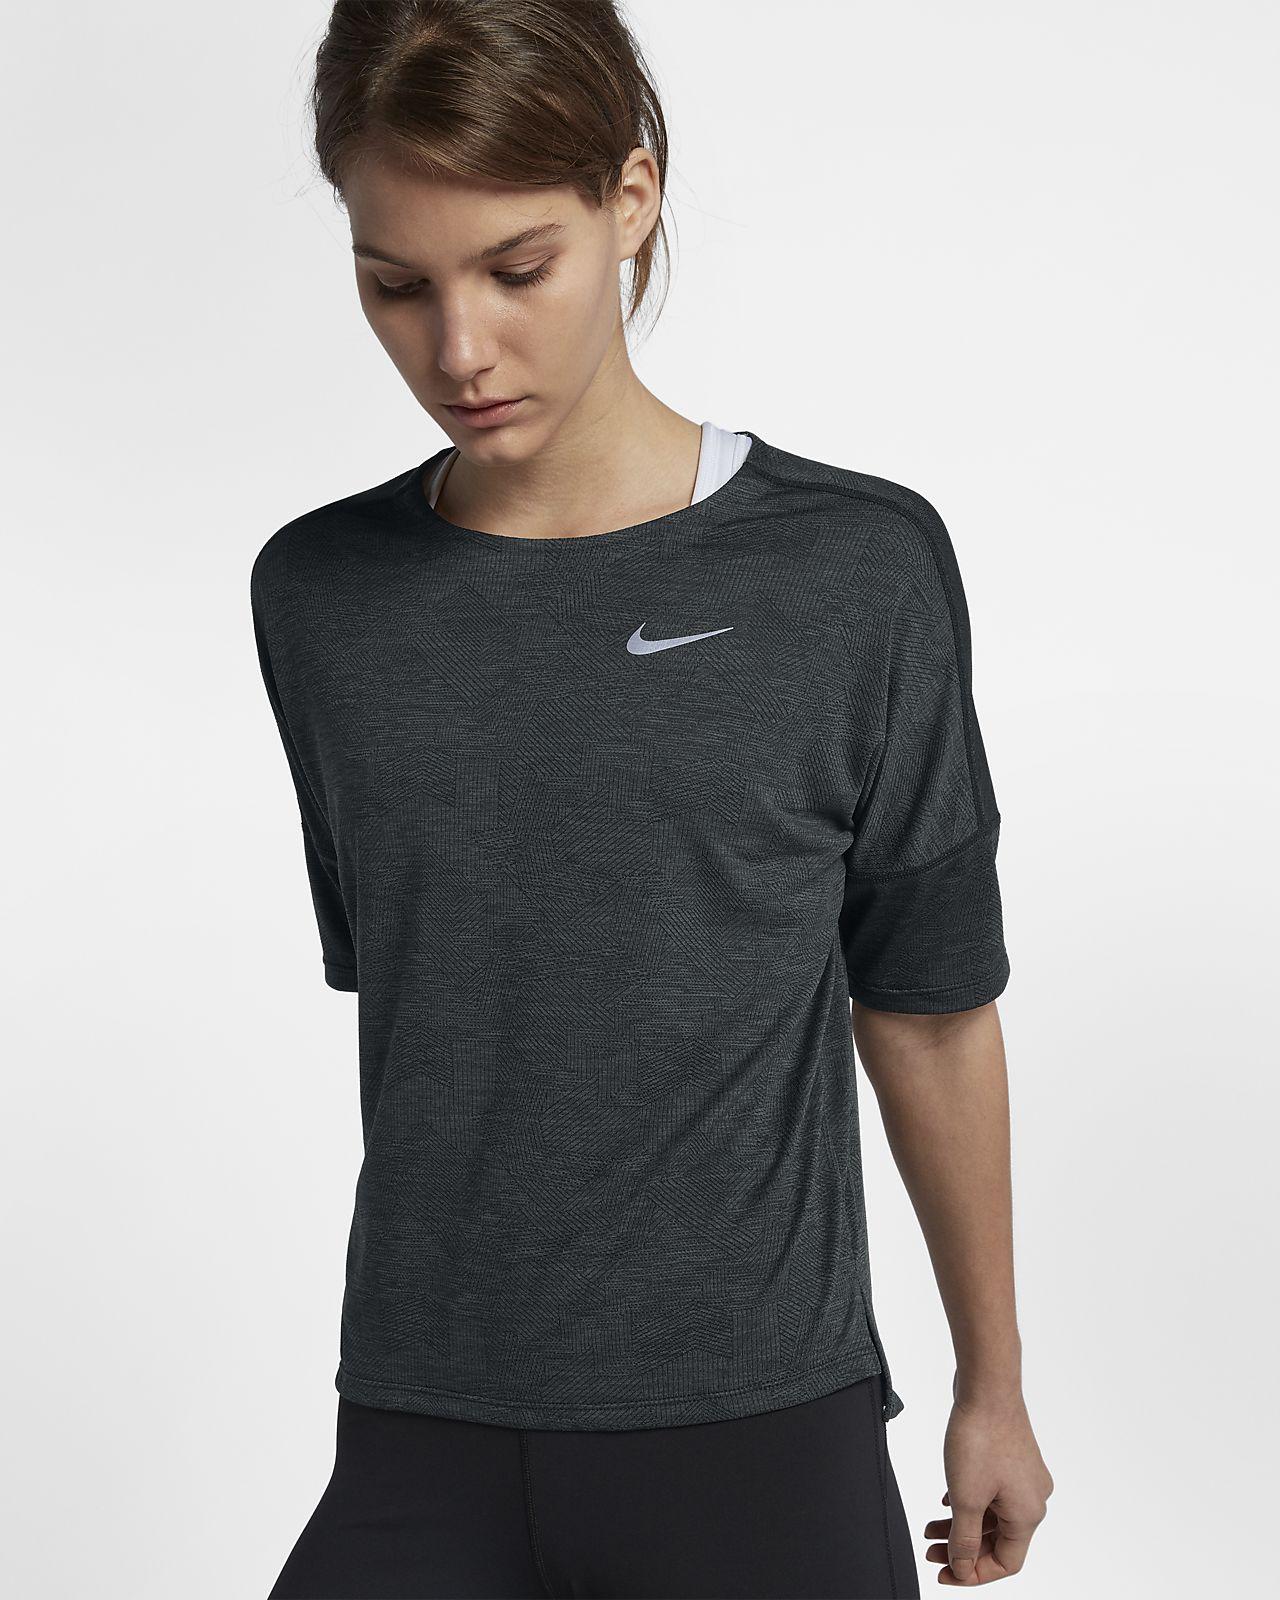 Running Fit Corta Manga Nike Dri Mujer Medalist De Camiseta qx5qX0wR